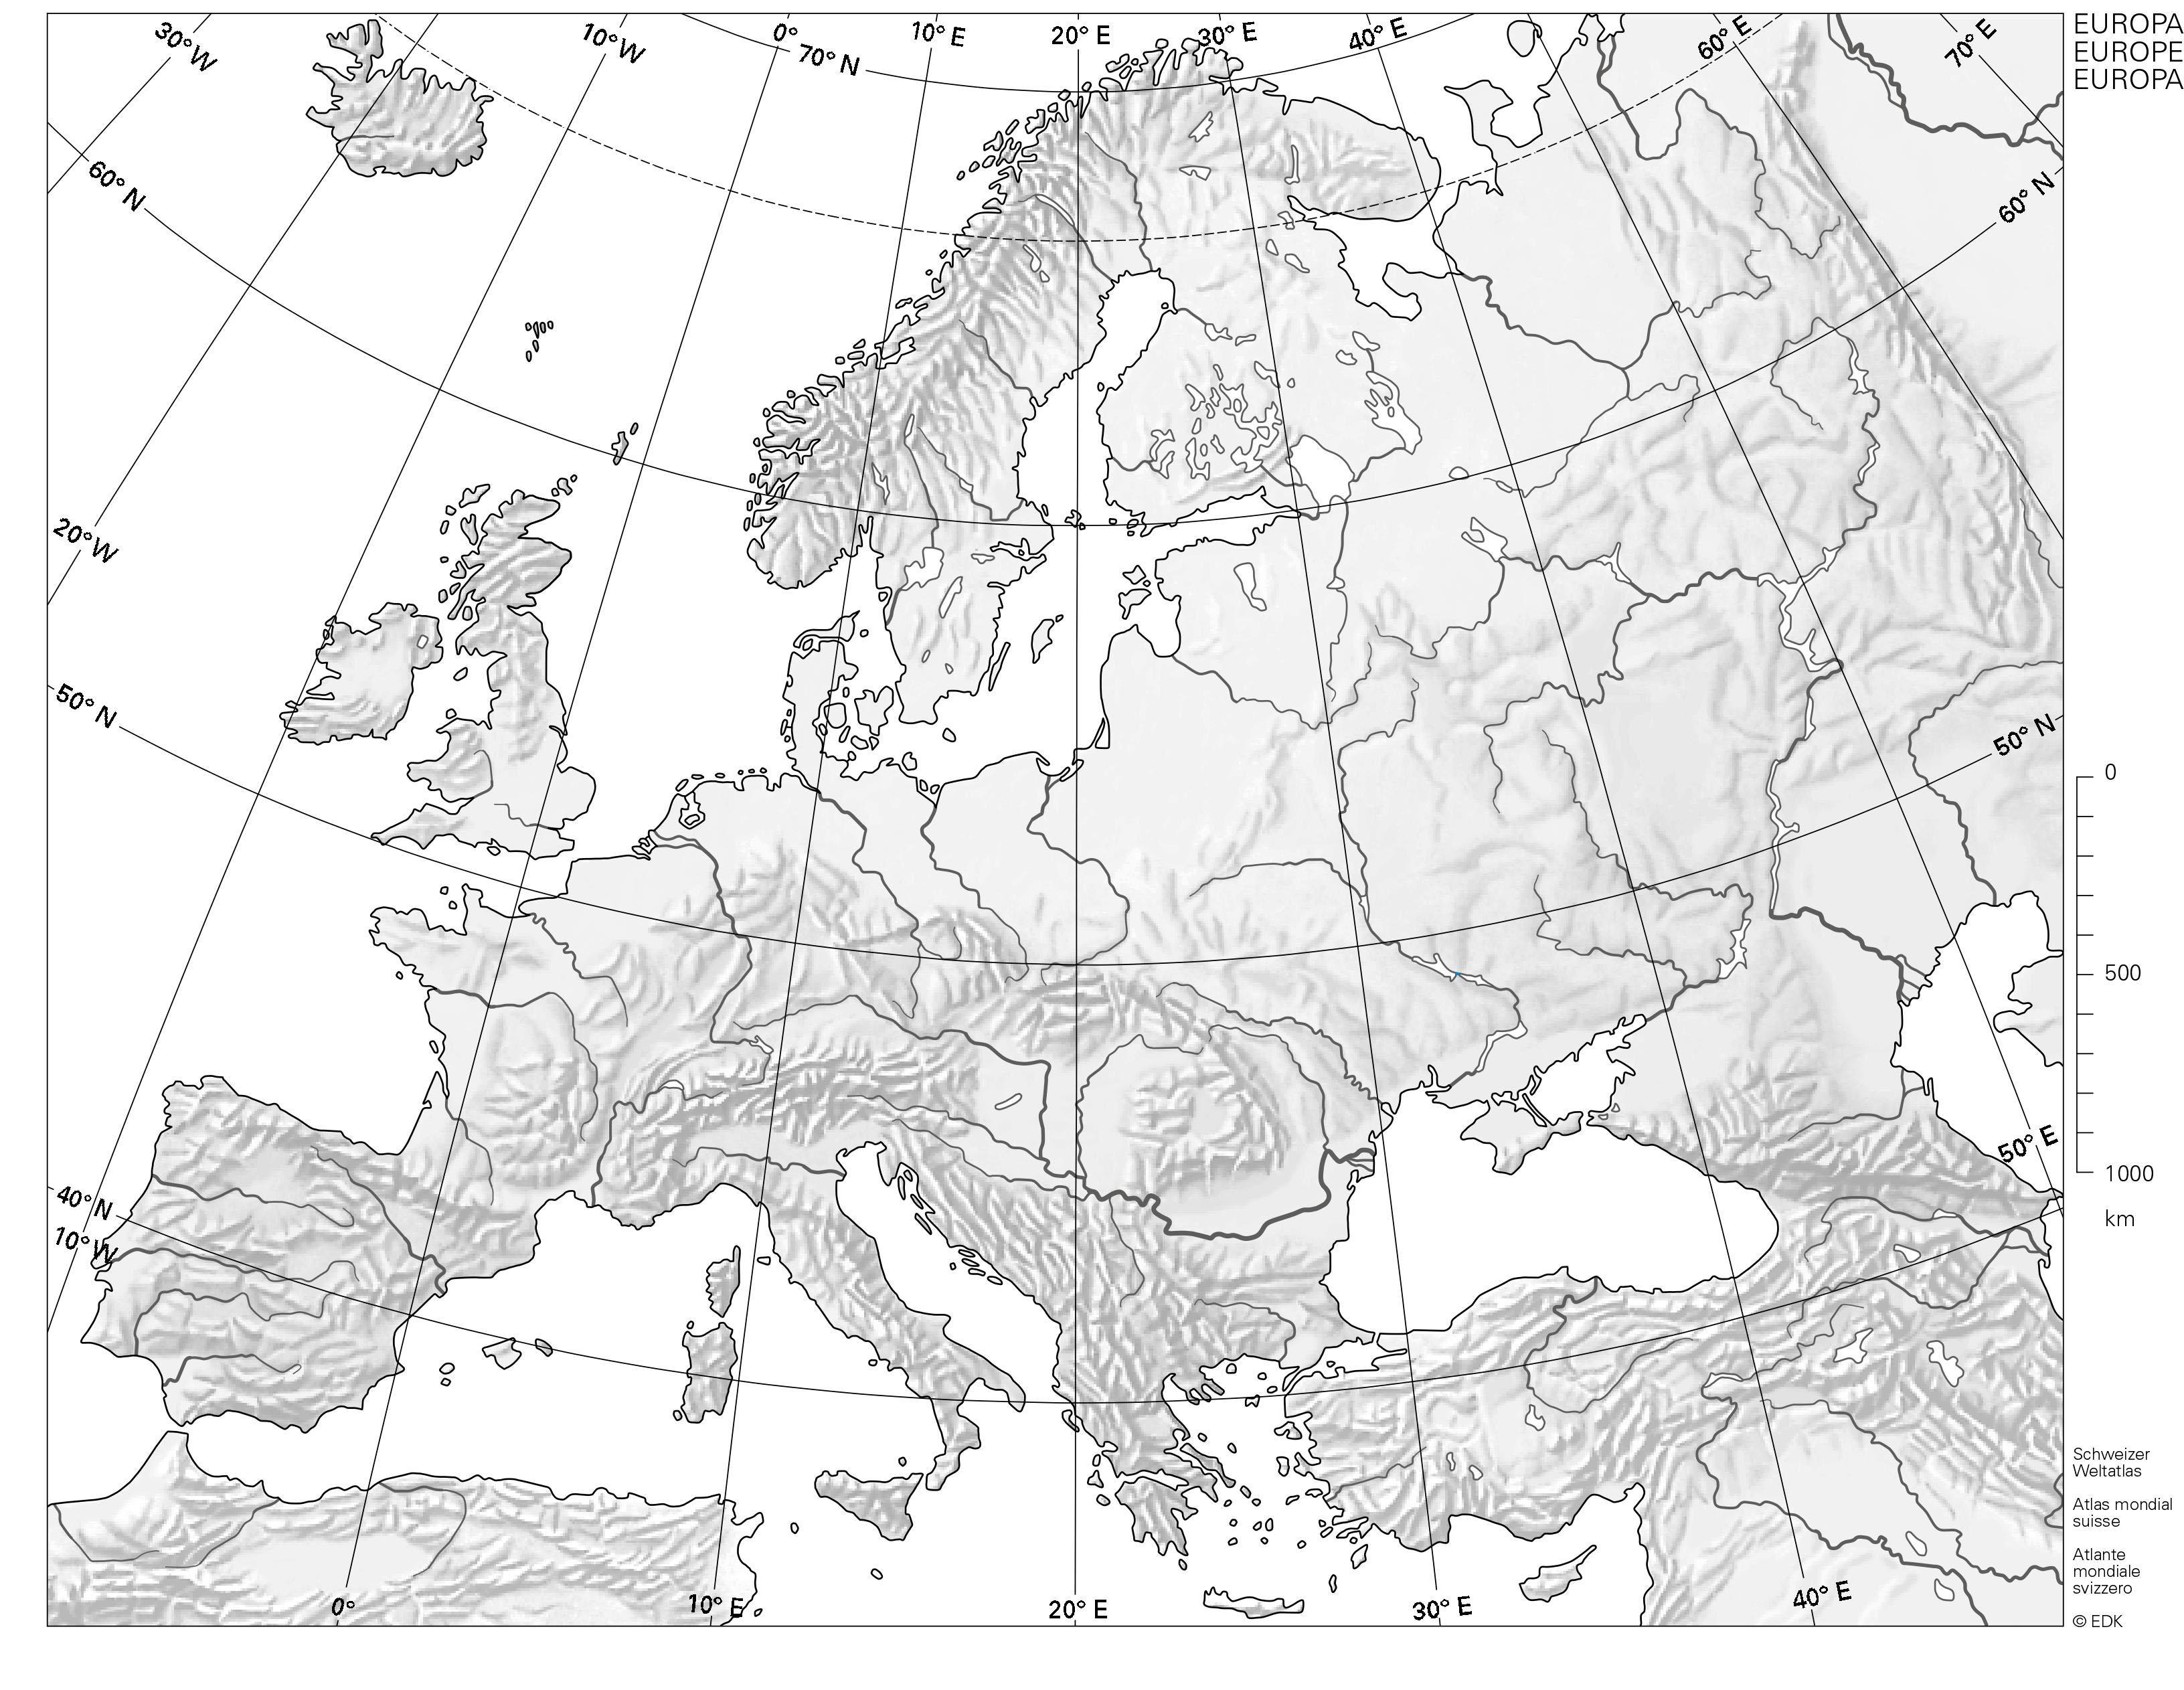 Berühmt Leere Karte Von Schottland Arbeitsblatt Bilder - Super ...